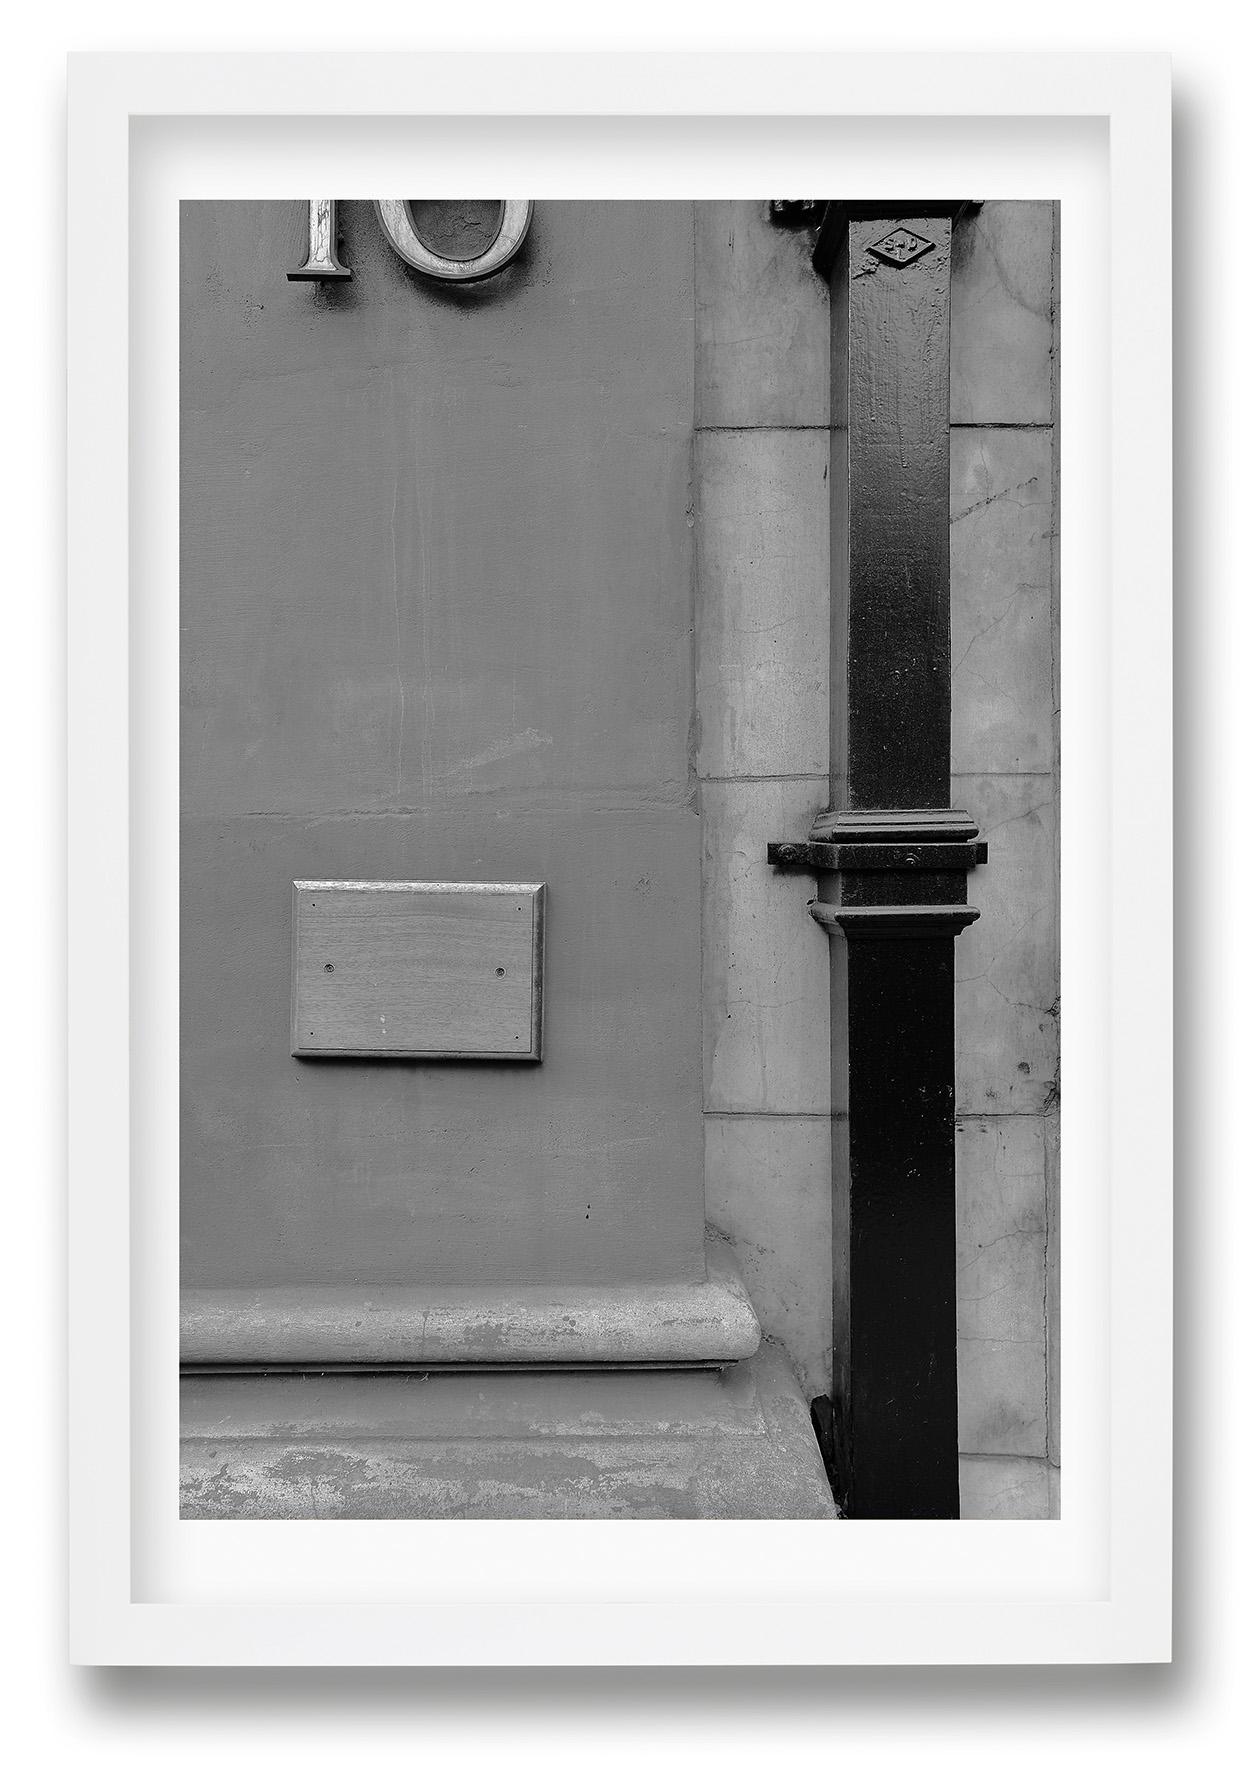 Rahmen_100x150_Hochformat_London_14_9_2017_0208_3